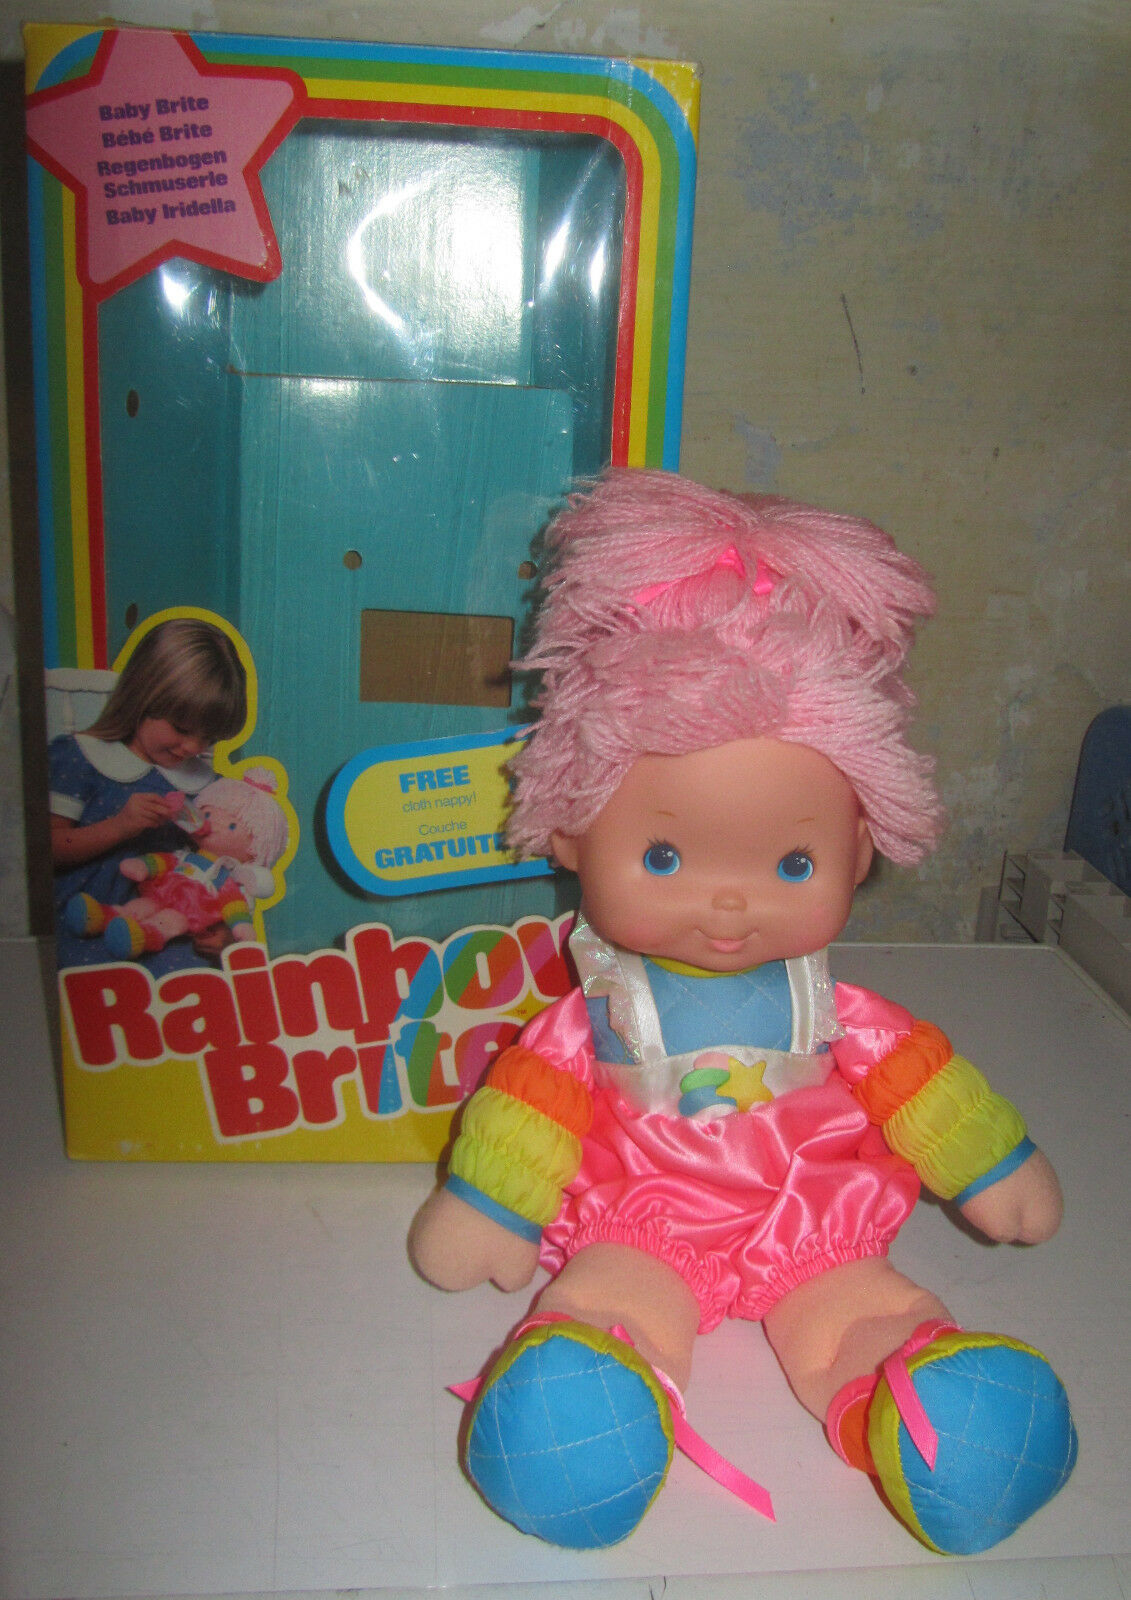 Bambola Iridella Rainbow Baby Brite SPESE GRATIS